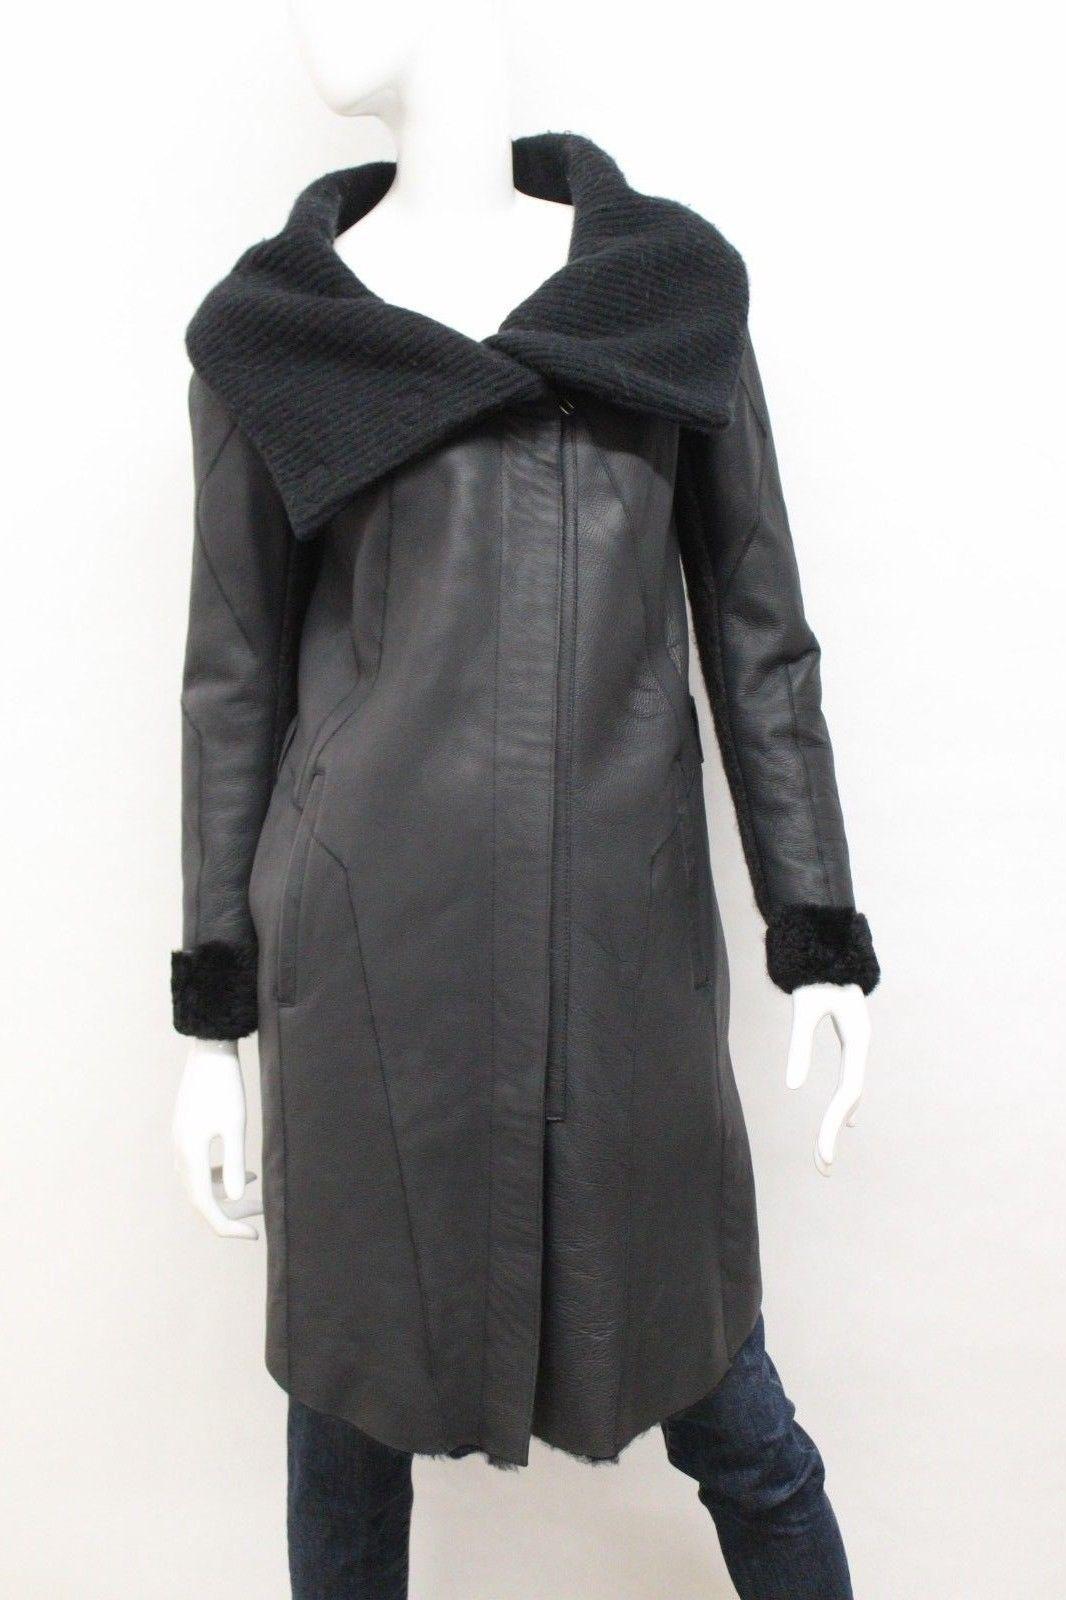 HELMUT LANG Women's Sherpa Lined Faux Leather Coat in